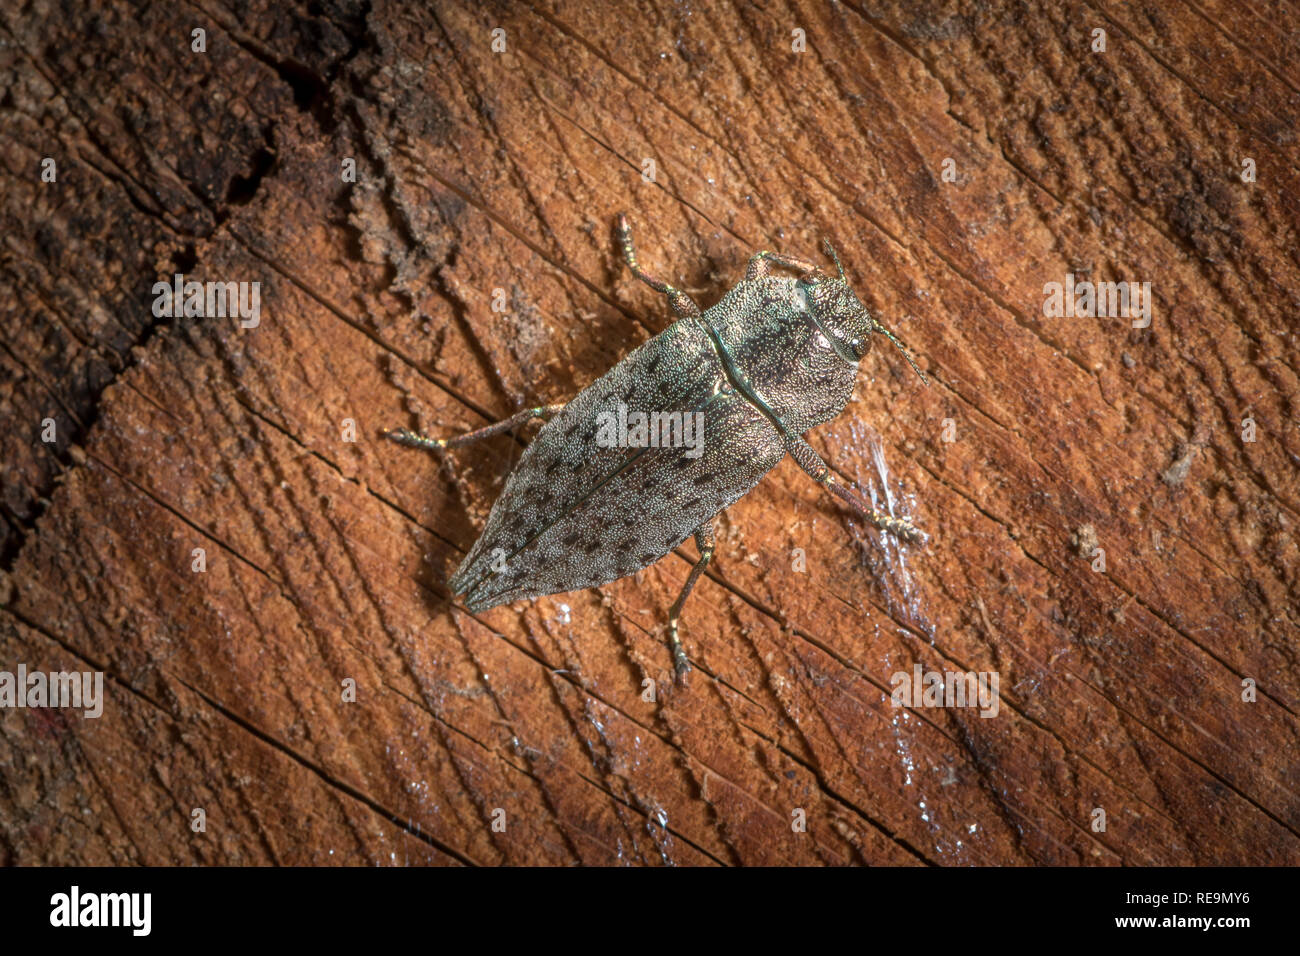 A big shiny beautiful jewel beetle (Dicerca alni, Buprestidae) sitting on wood - Stock Image